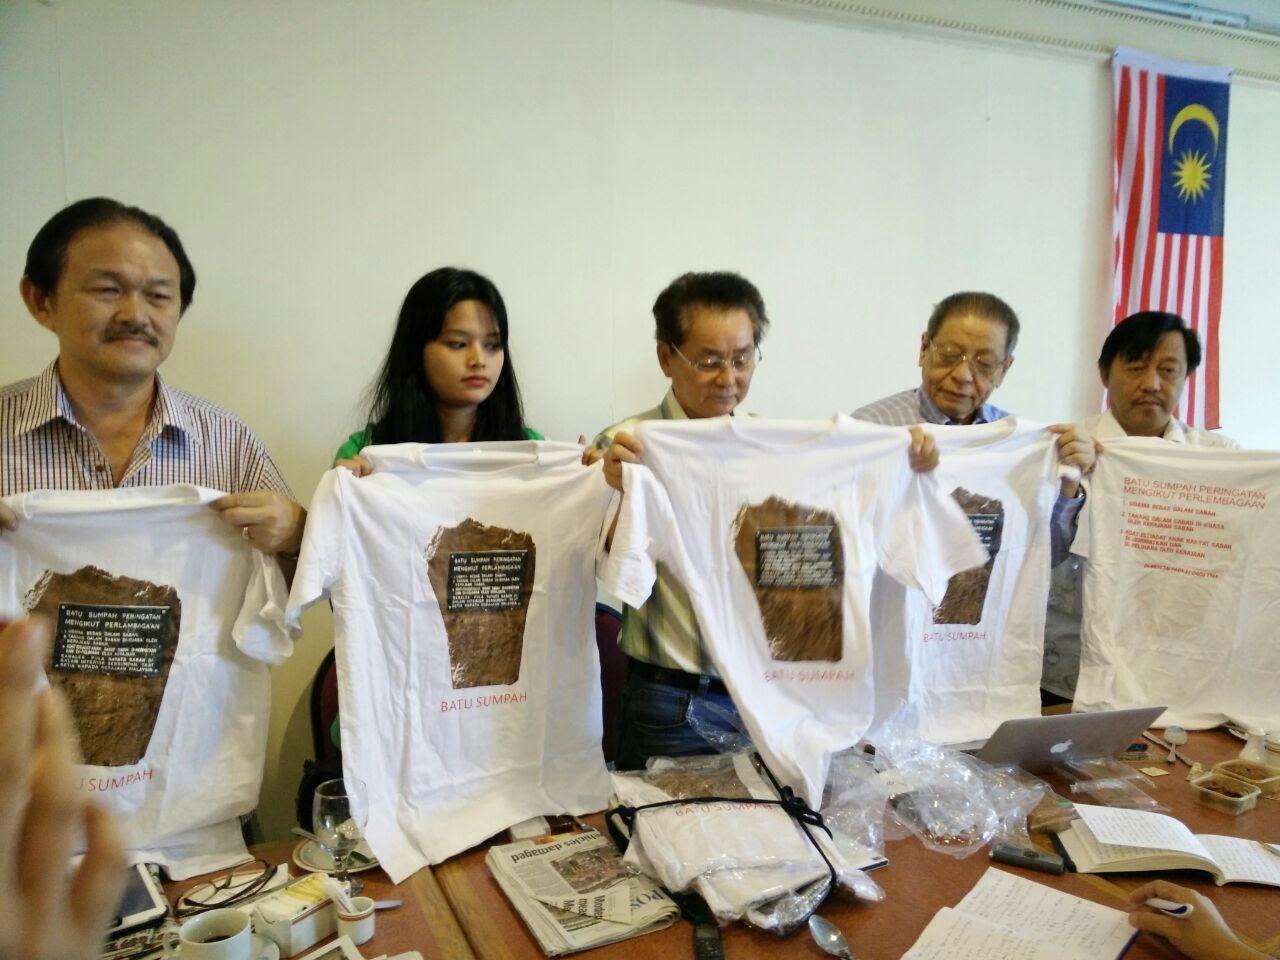 Ketika PPS provok Polis Kit Siang ke Sabah persoal kuasa Pusat untuk pecahkan M sia